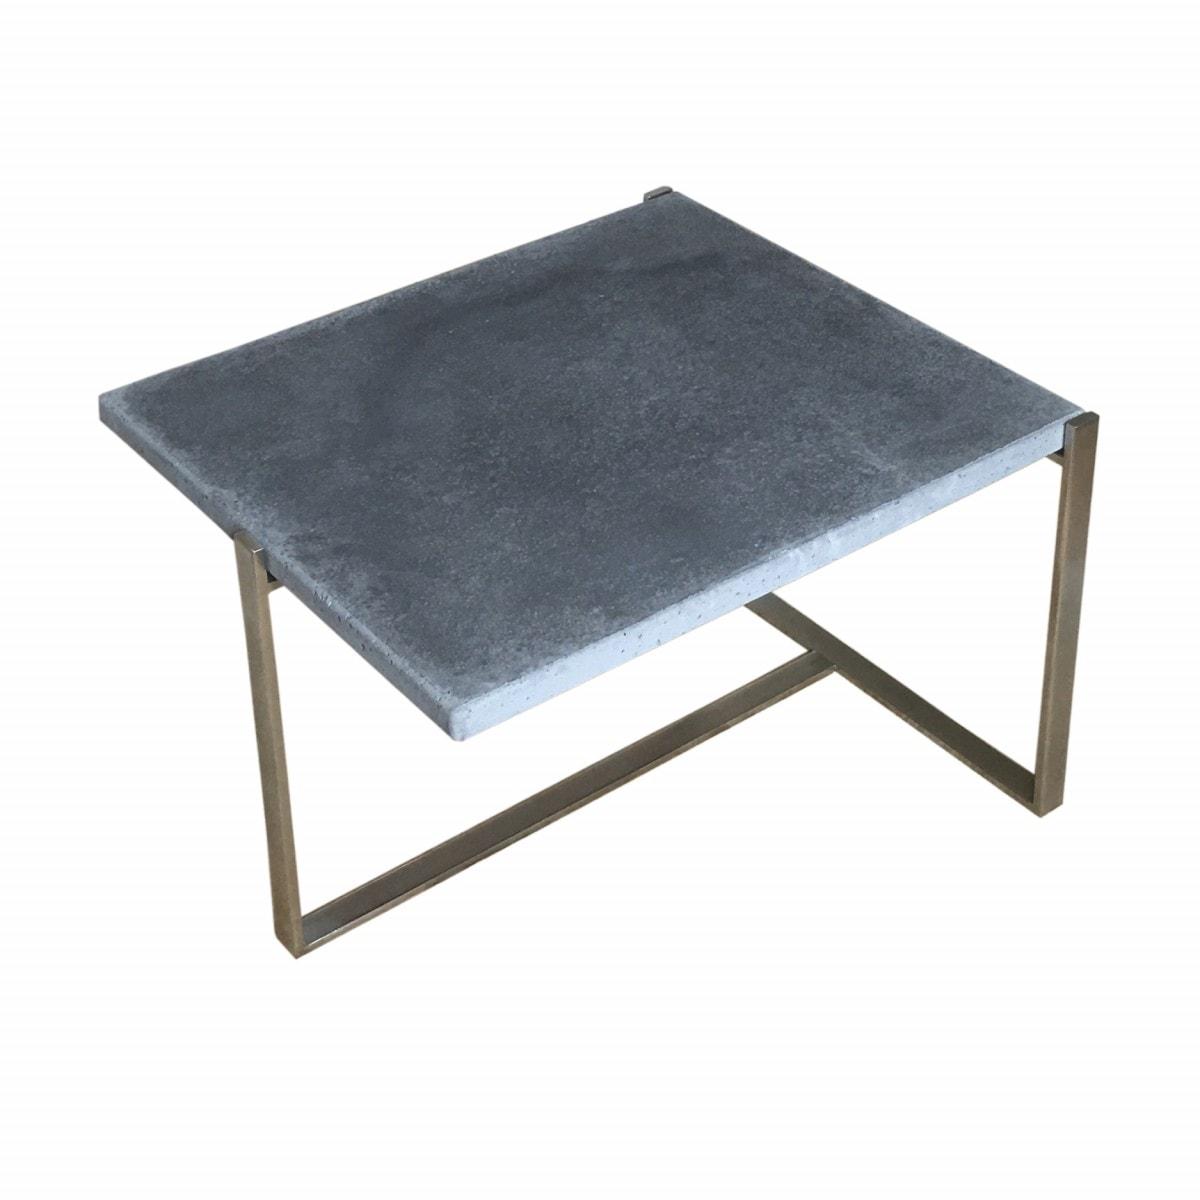 betonsofabord